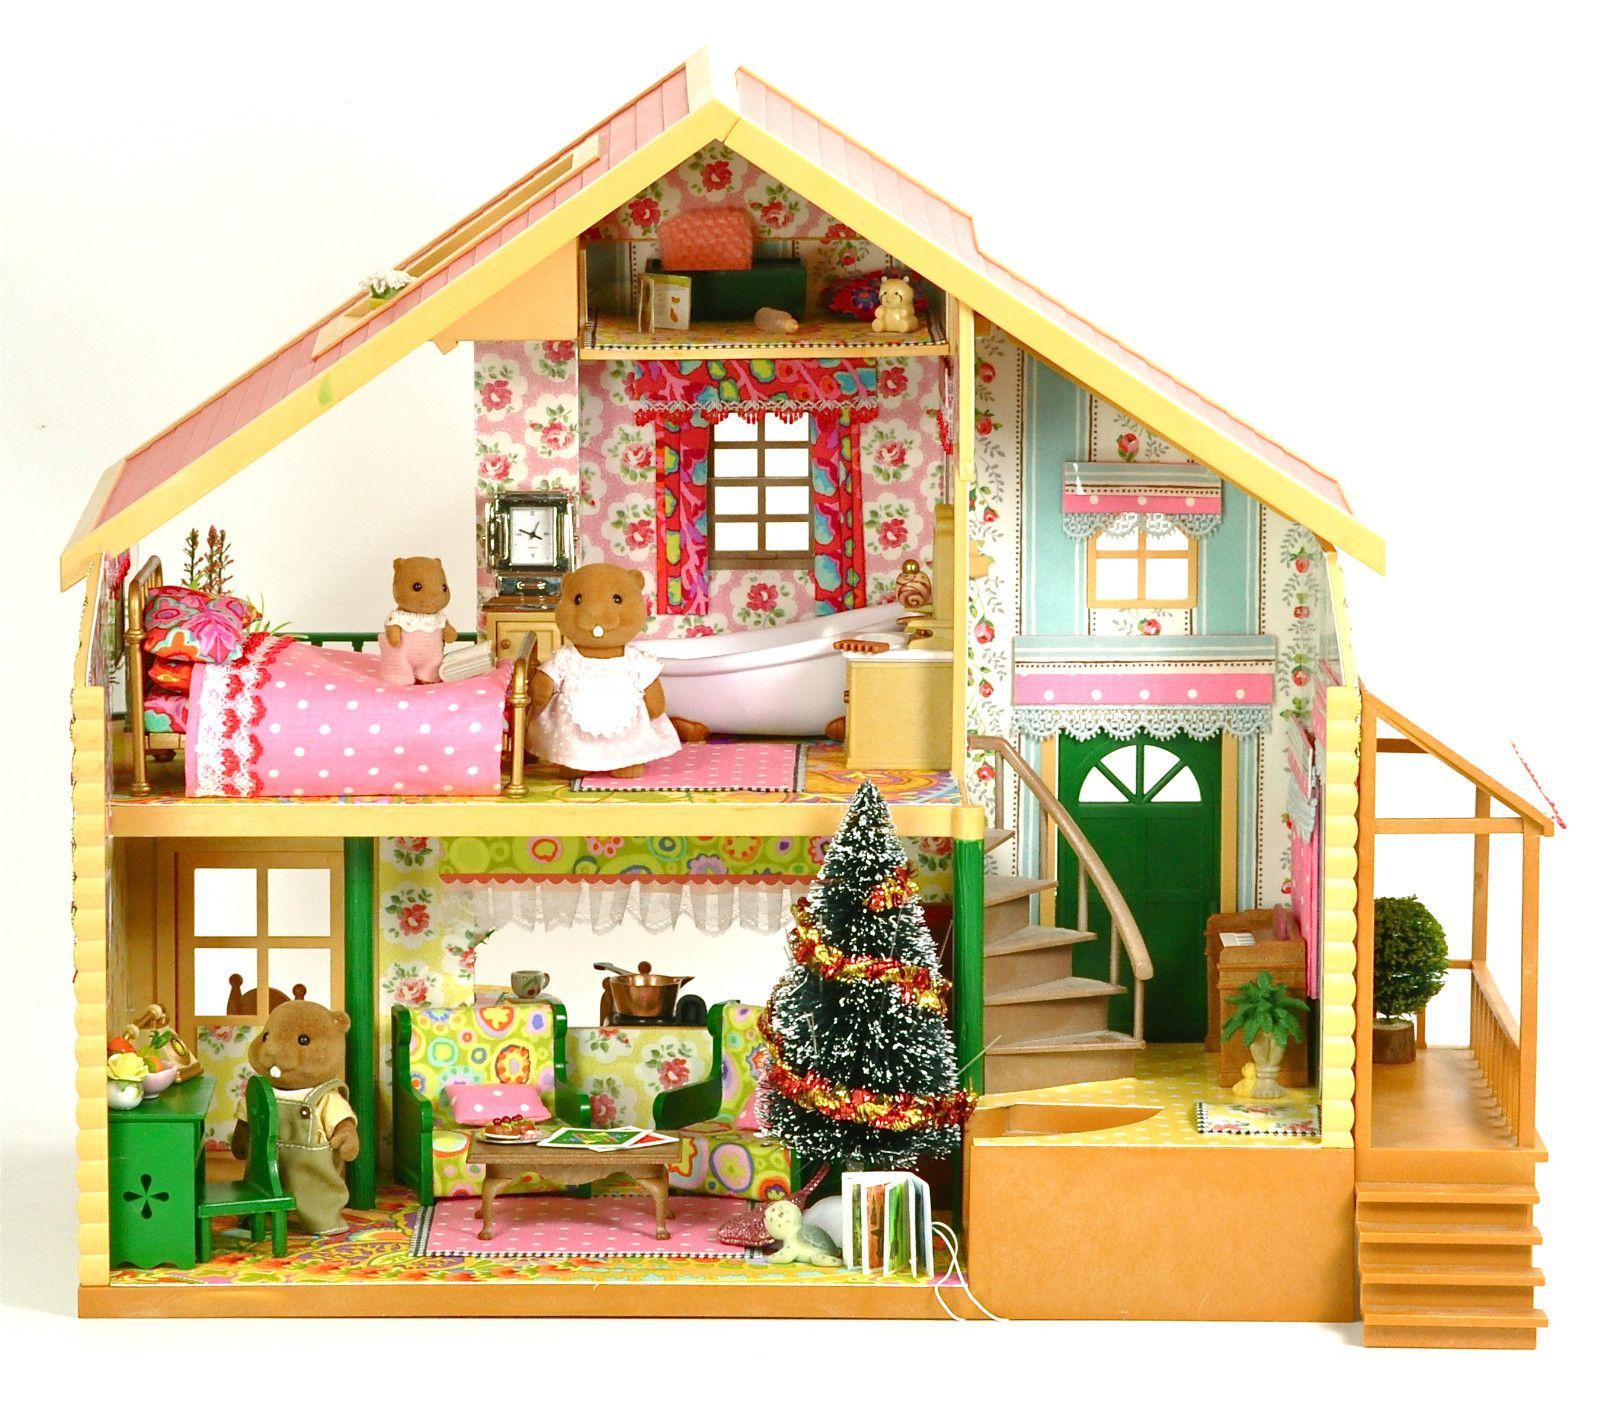 Sylvanian families cath kidston kaffe fassett decorated furnished house ebay fistuff